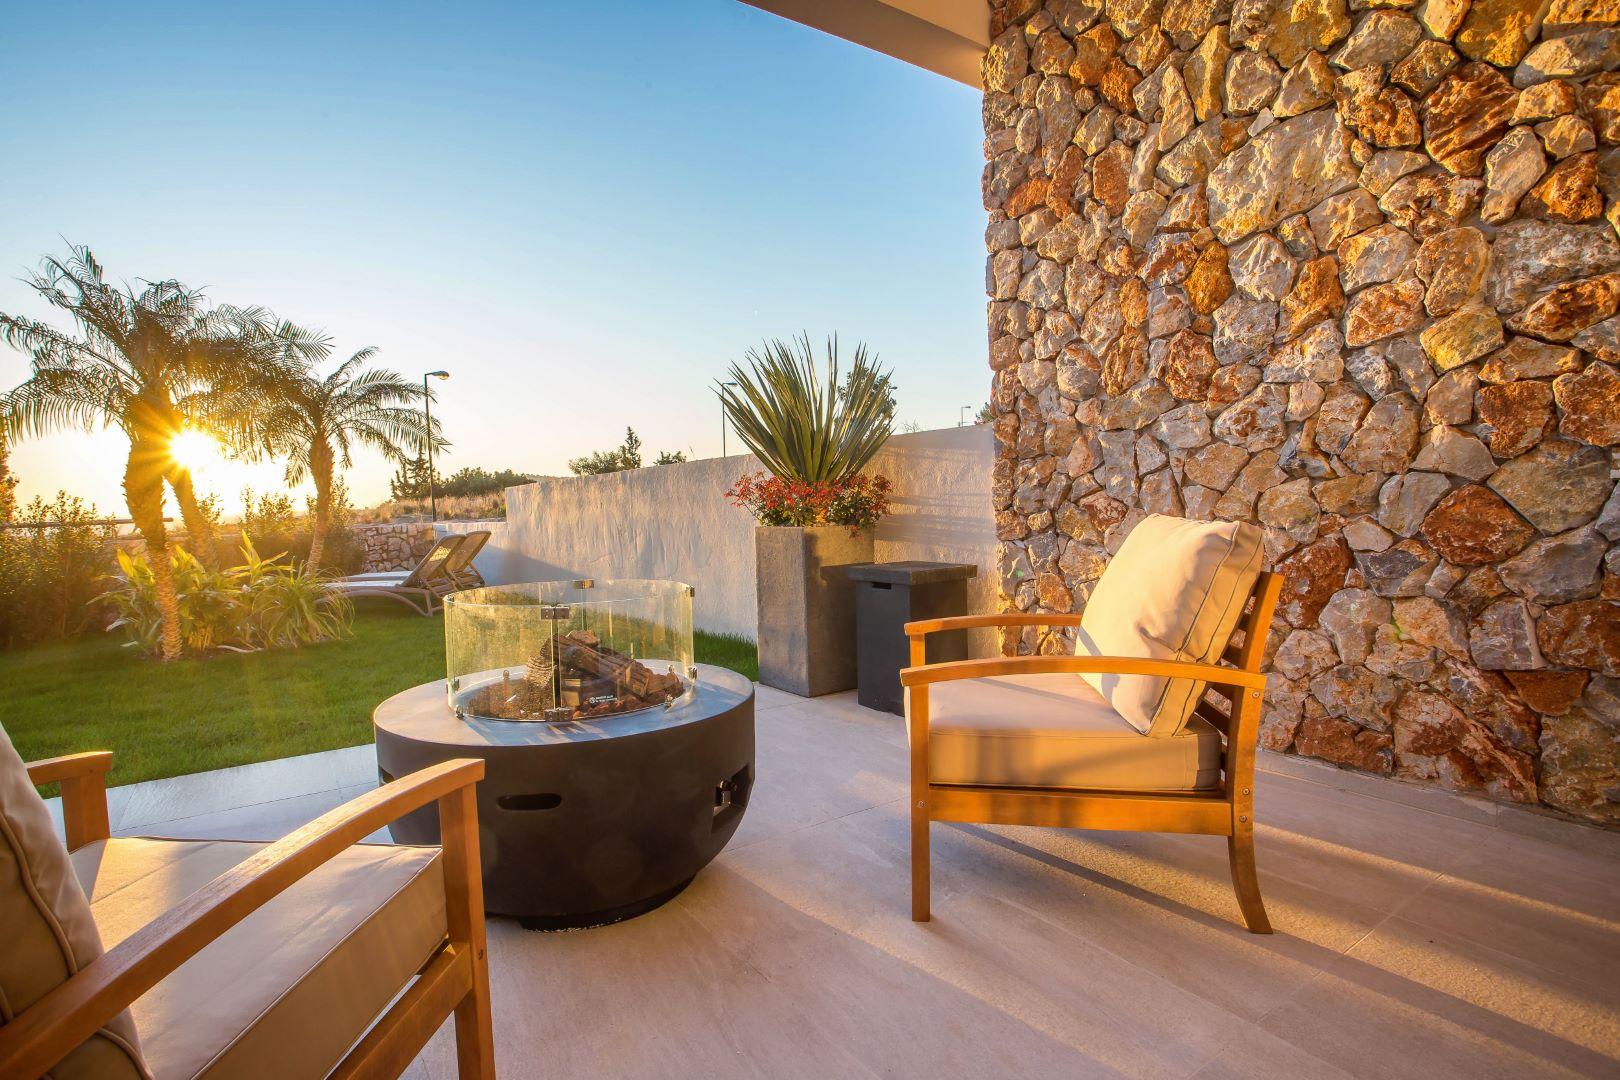 Venezia-Luxury-Living-villas-at-Faliraki-Rhodes-Greece-9